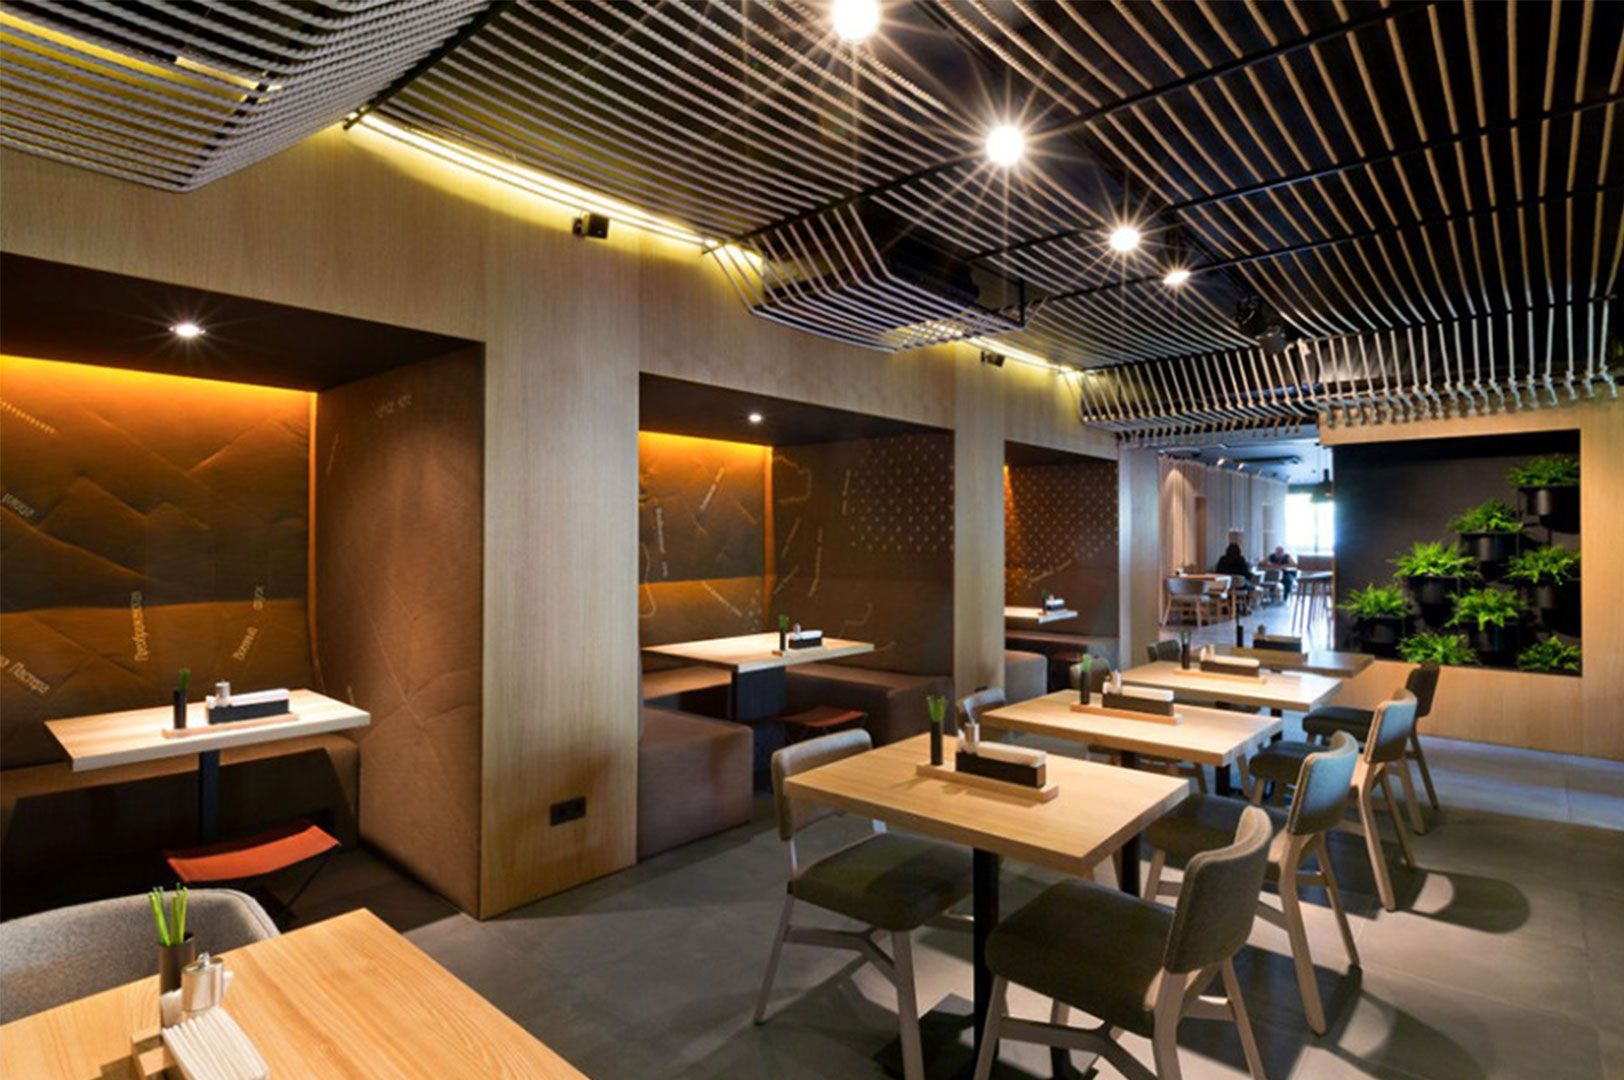 restaurant wall decor ideas - google search | bon deco | pinterest